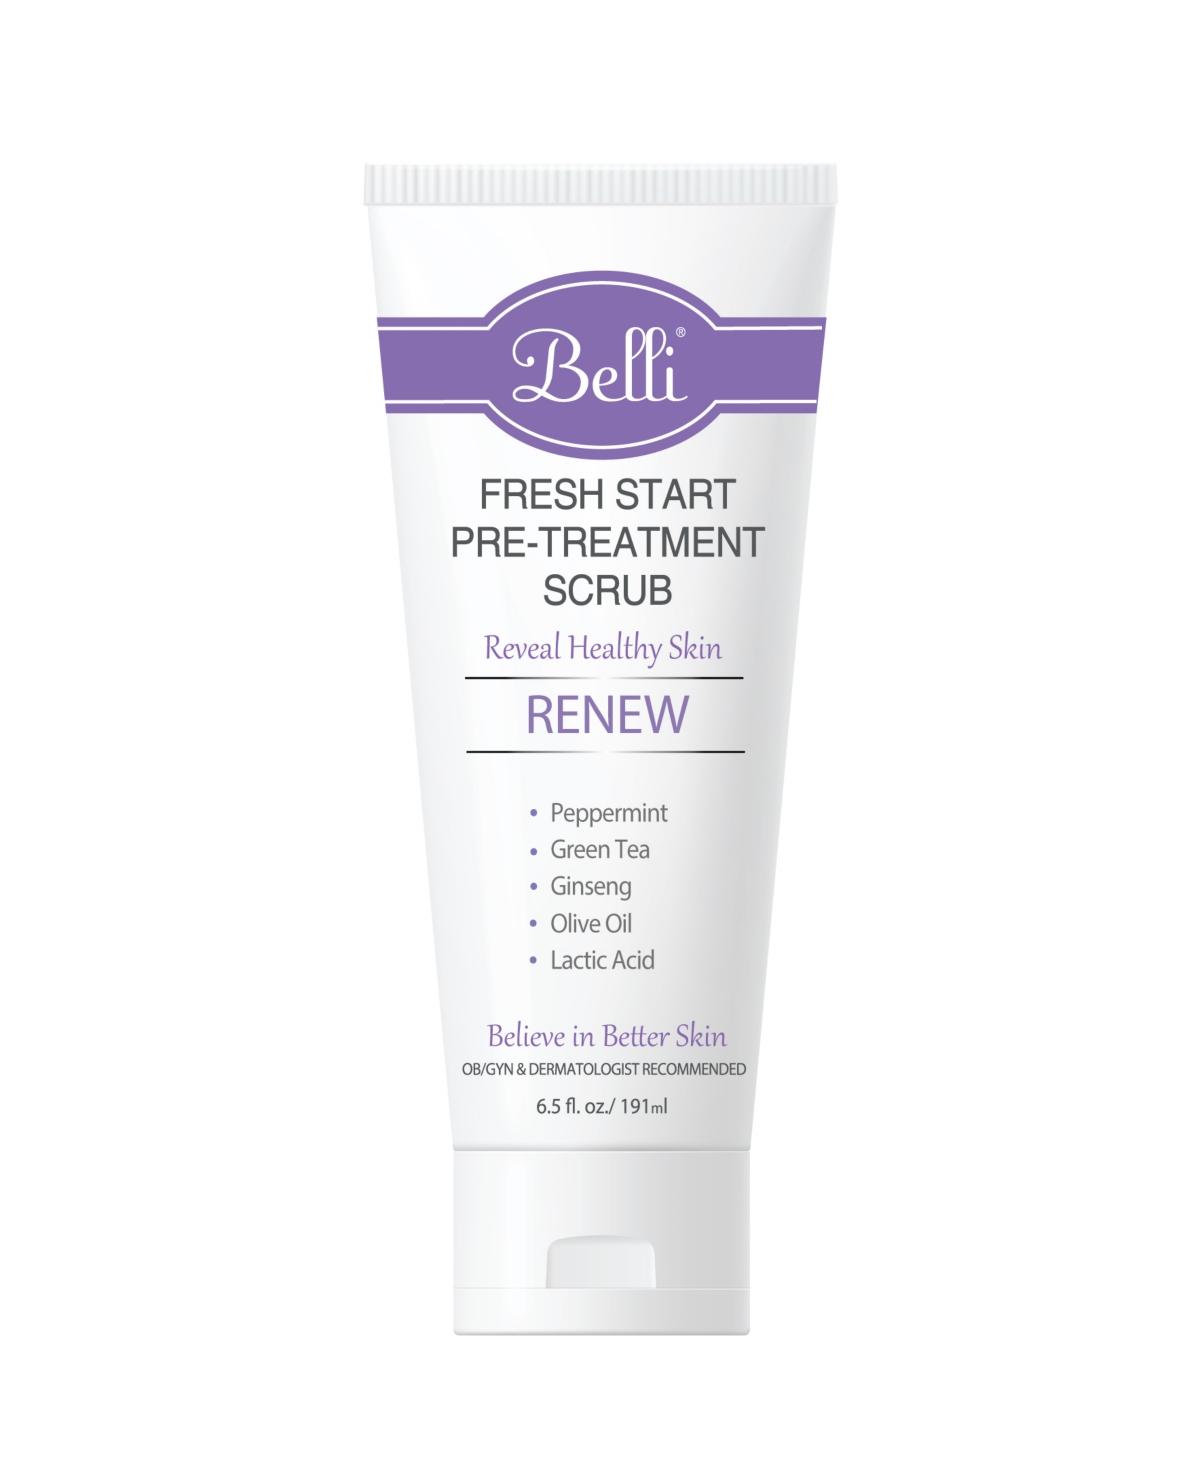 Belli Skin Care Fresh Start Pre-Treatment Scrub, 6.5 fl oz